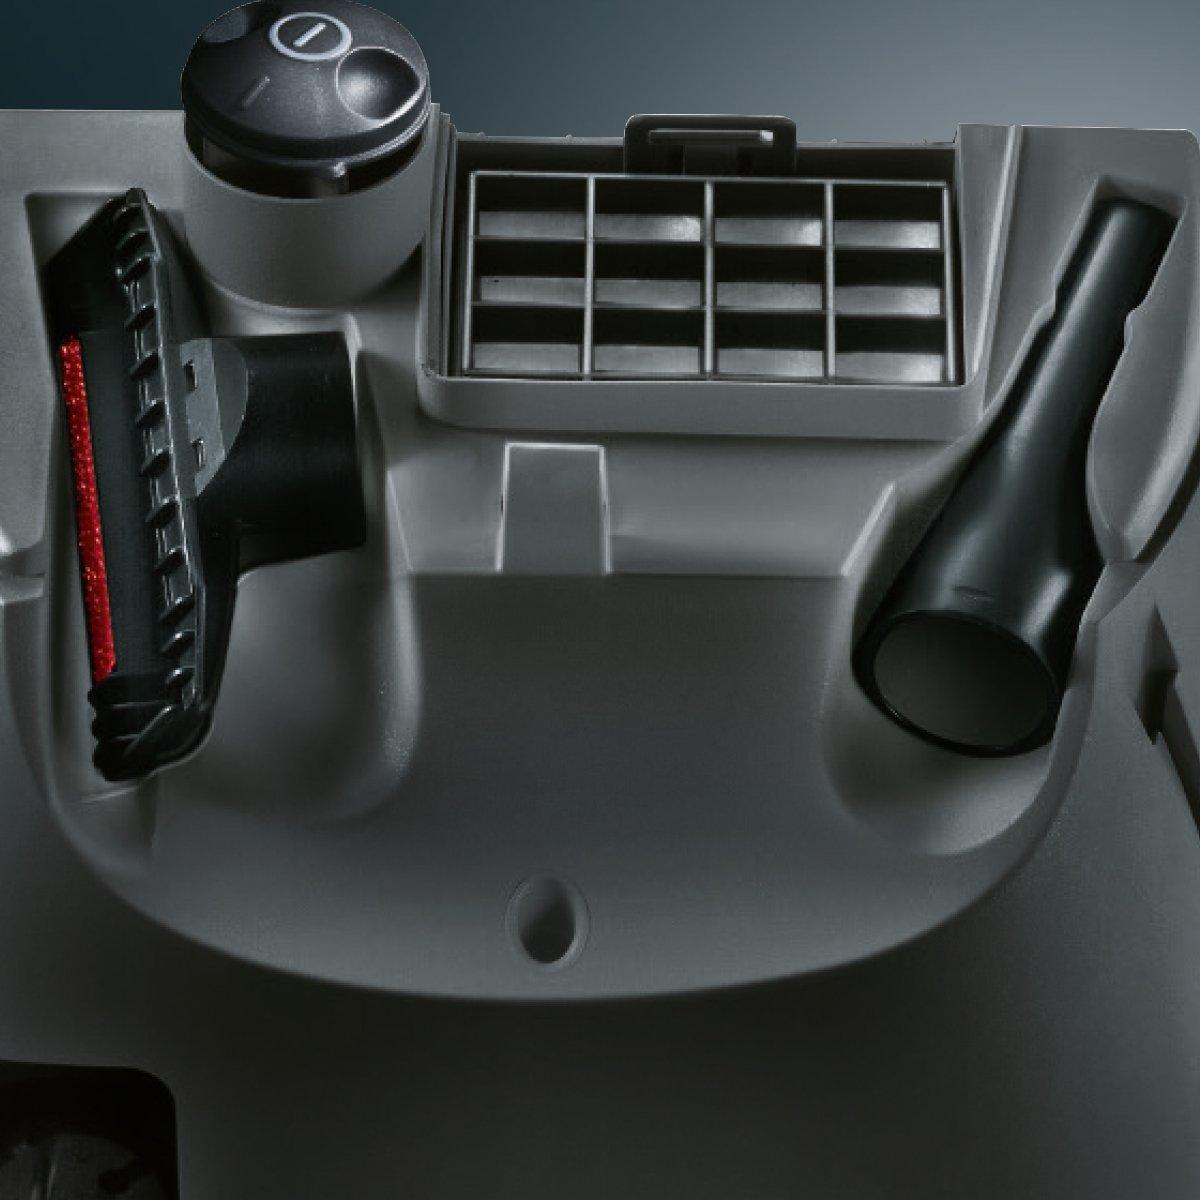 600 W, Aspiradora cil/índrica, Secar, Bolsa para el polvo, 4 L, Filtro higi/énico Aspiradora Siemens VSZ3MULTI